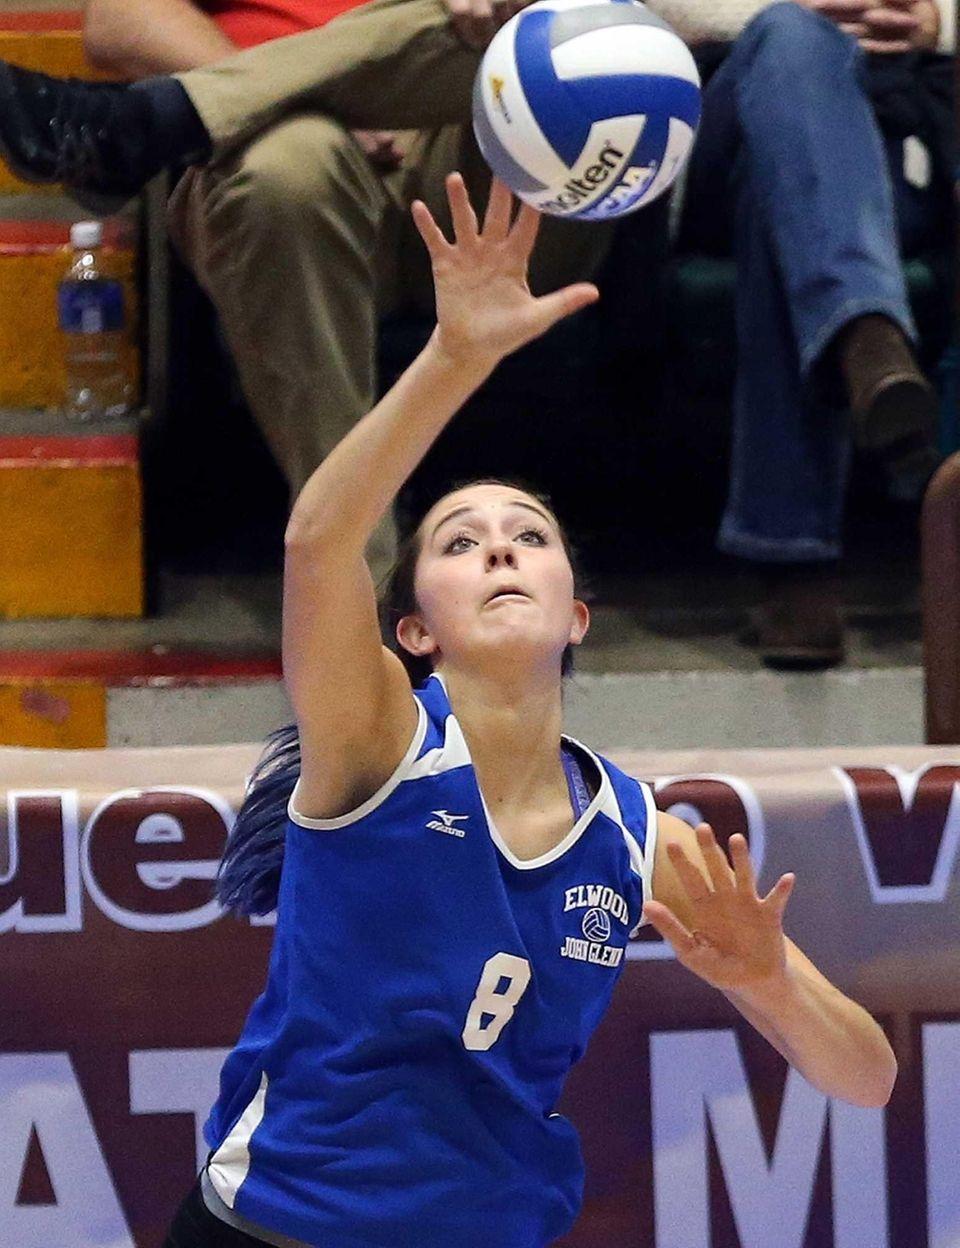 Glenn's Grace Cergol serves at the girls volleyball